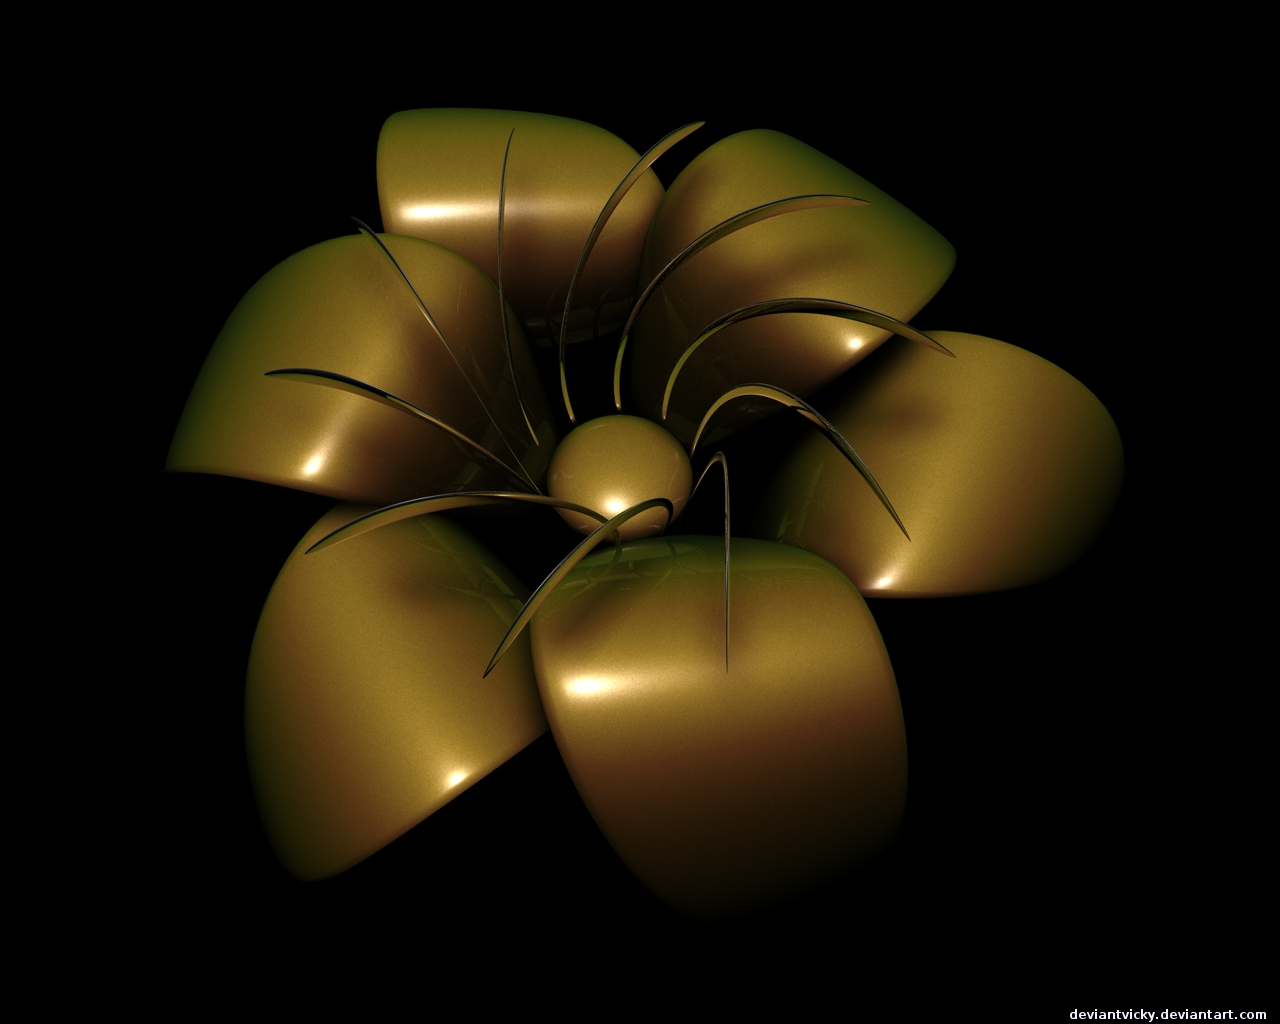 Golden Flower by VickyM72 on DeviantArt